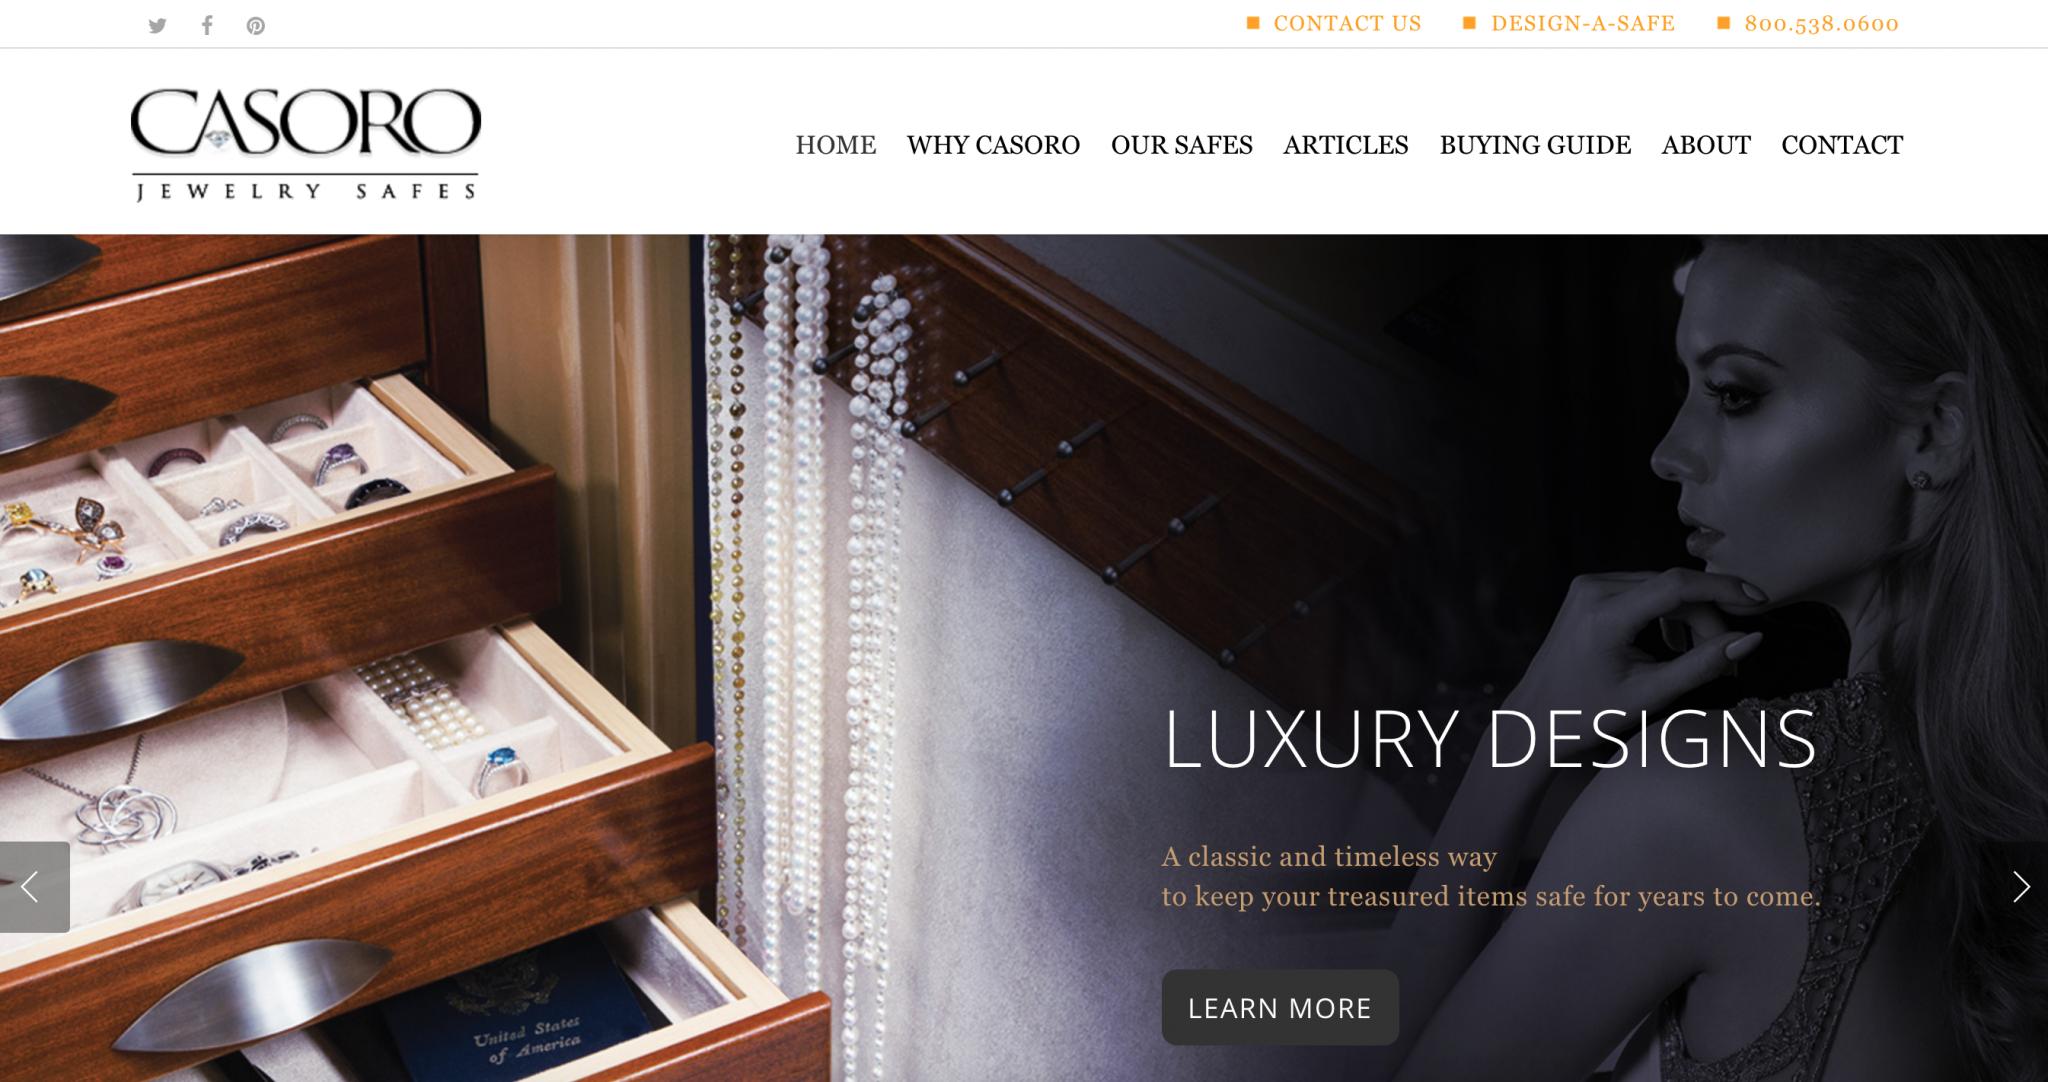 Casoro Jewelry Safes website